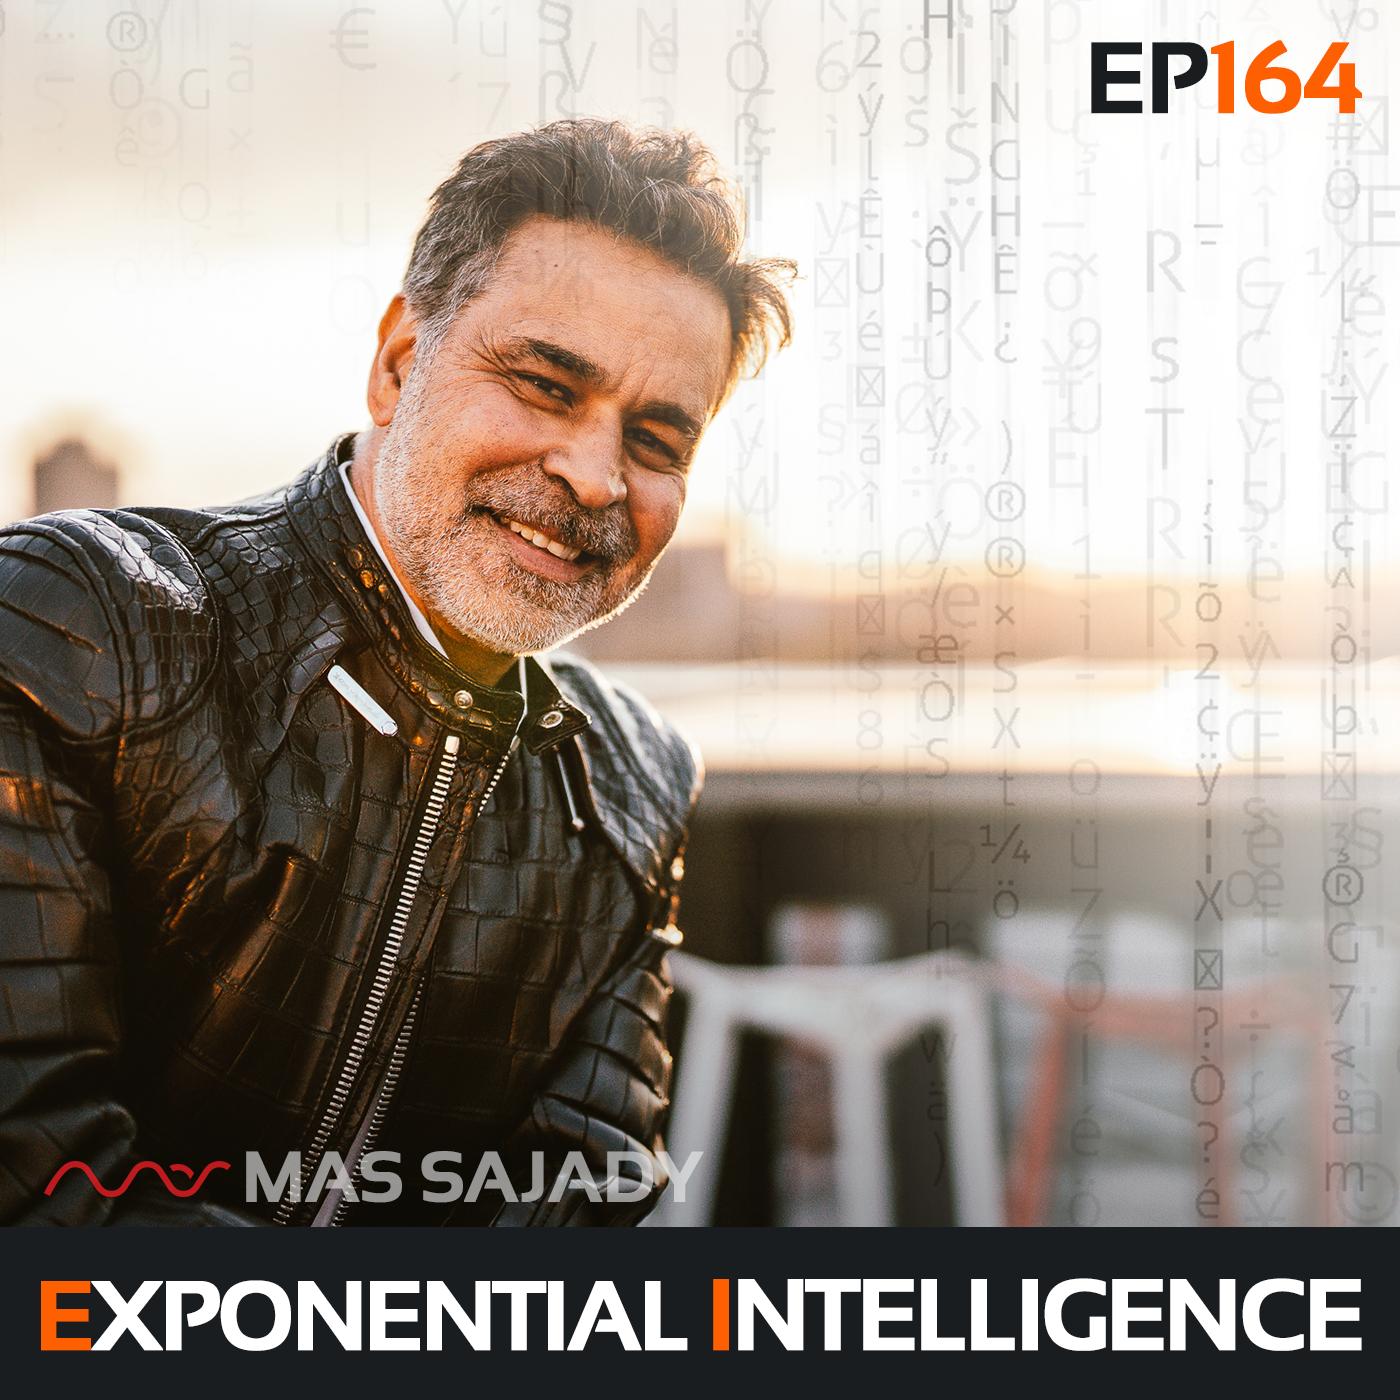 mas-sajady-exponential-intelligence-podcast-ayahuasca-good-bad-ugly-part-1.png